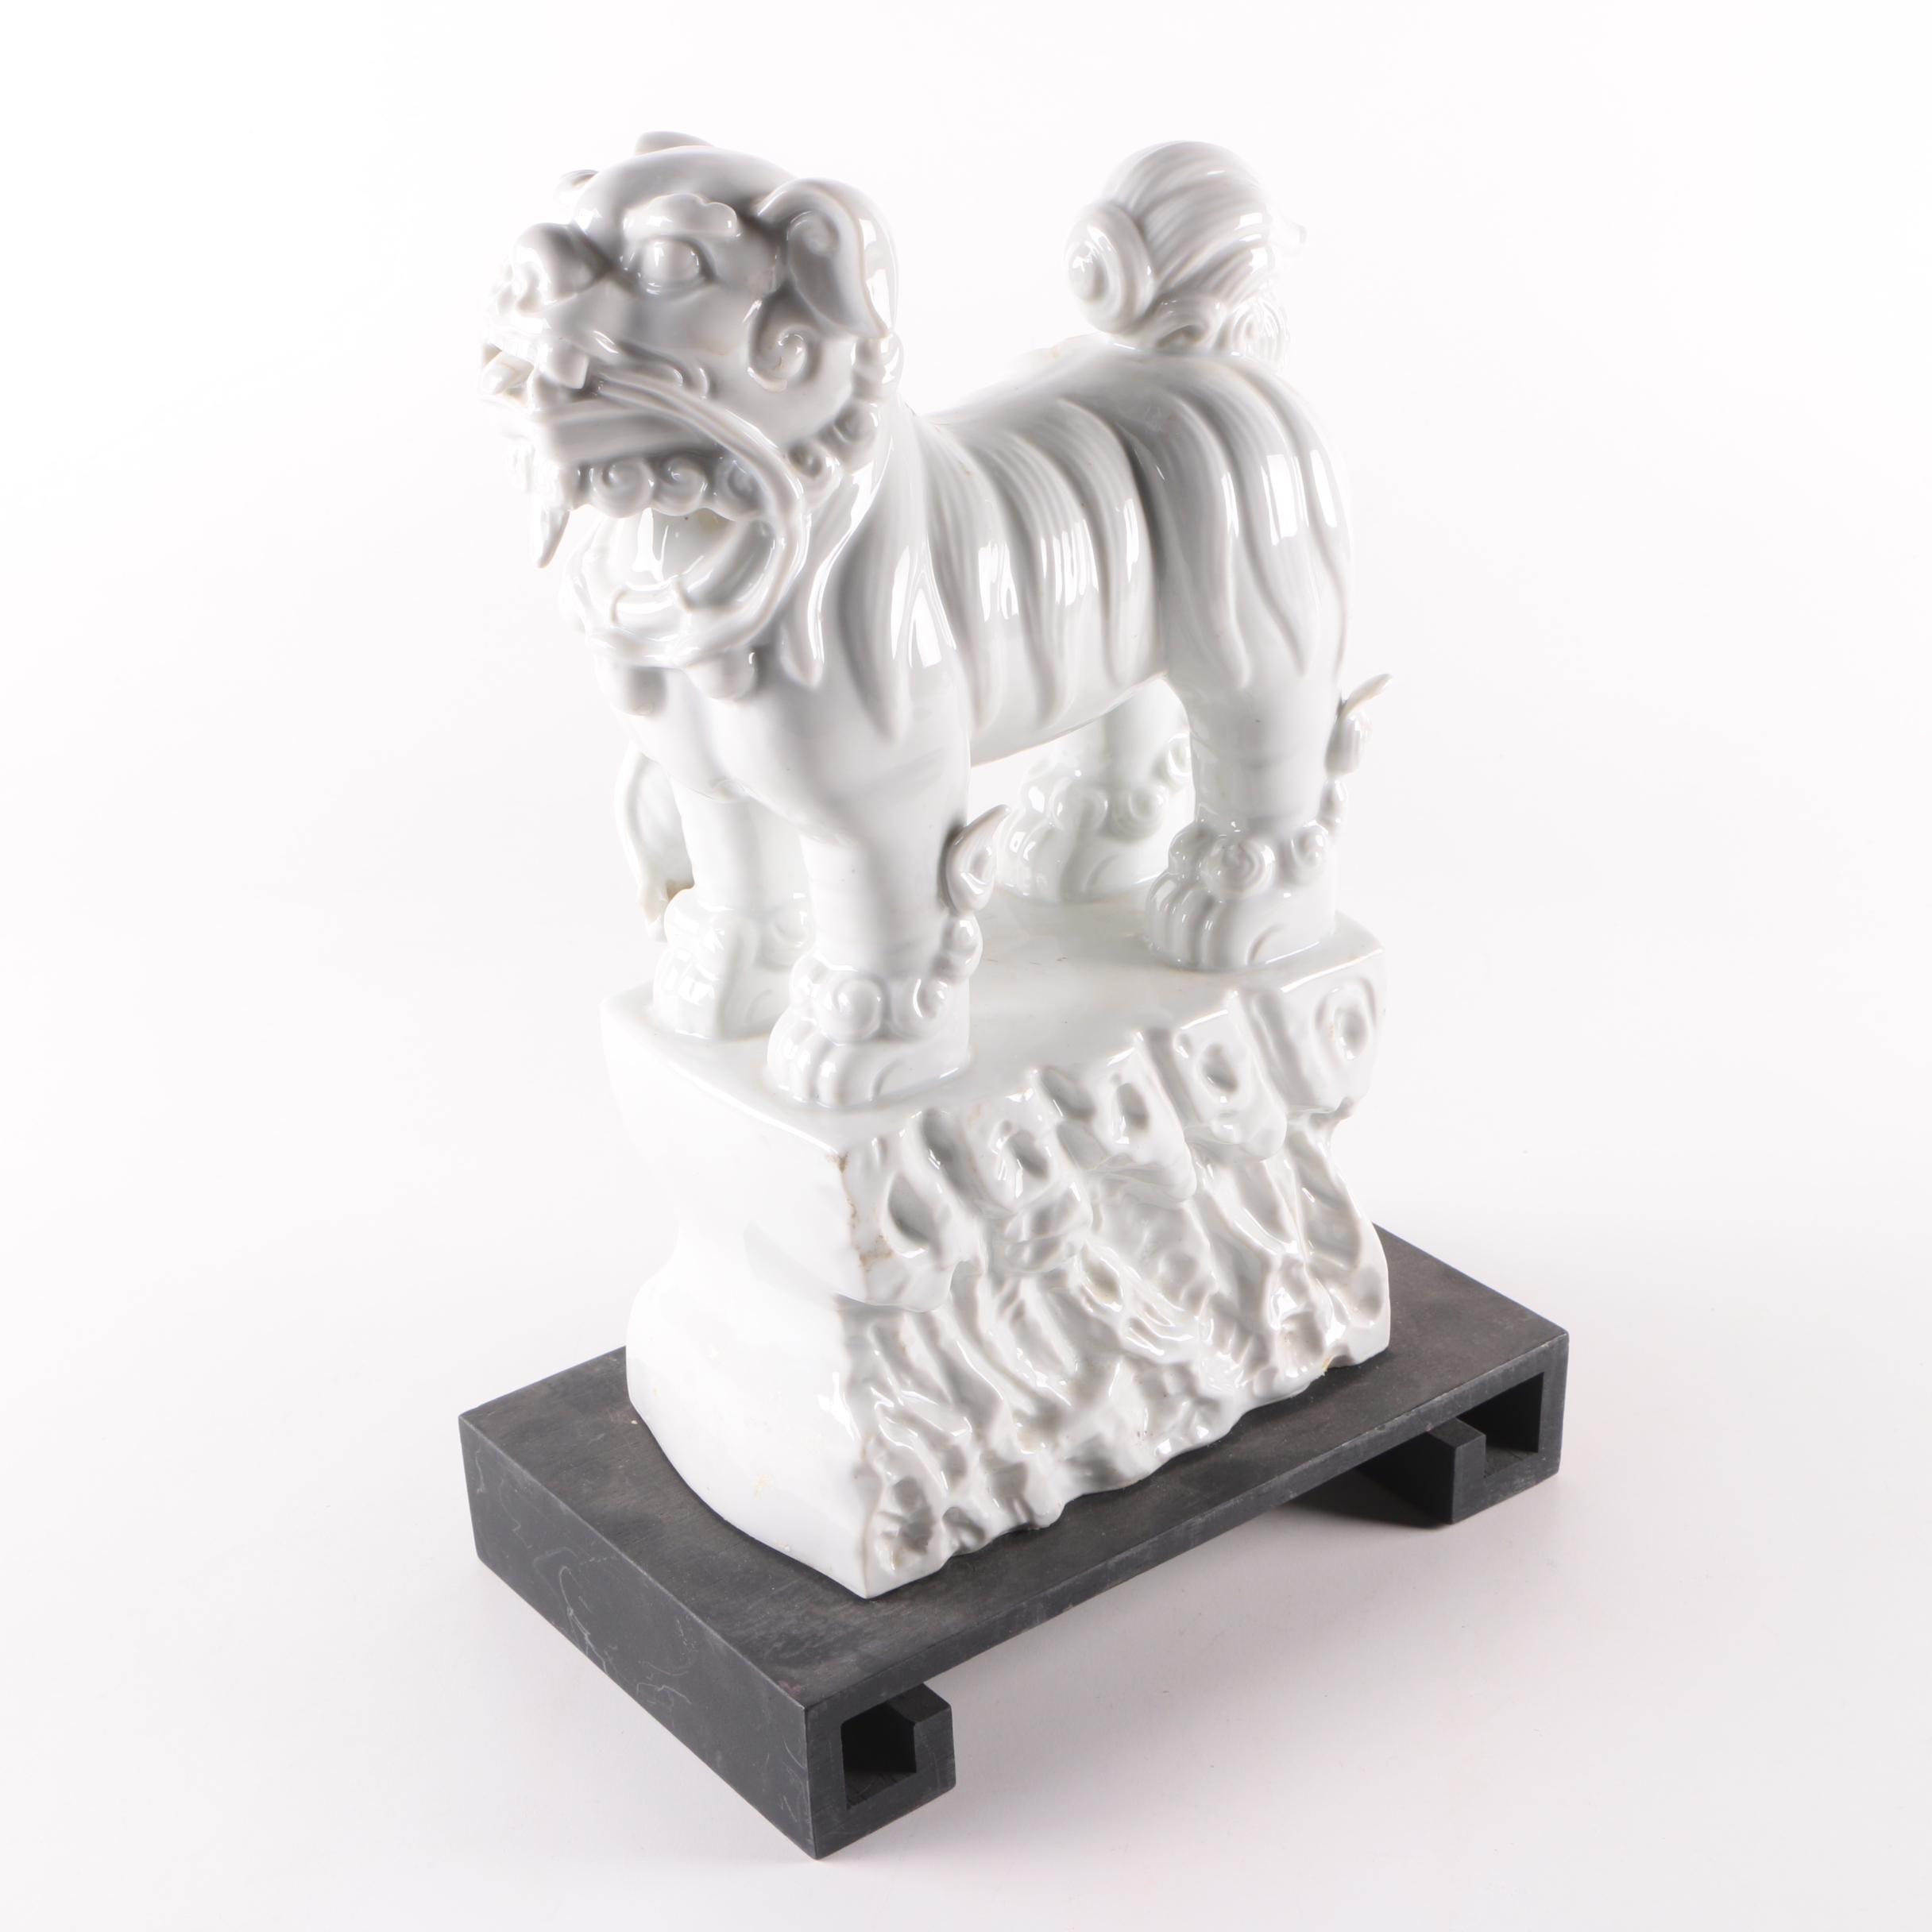 Ceramic Guardian Lion Figurine on Wooden Base